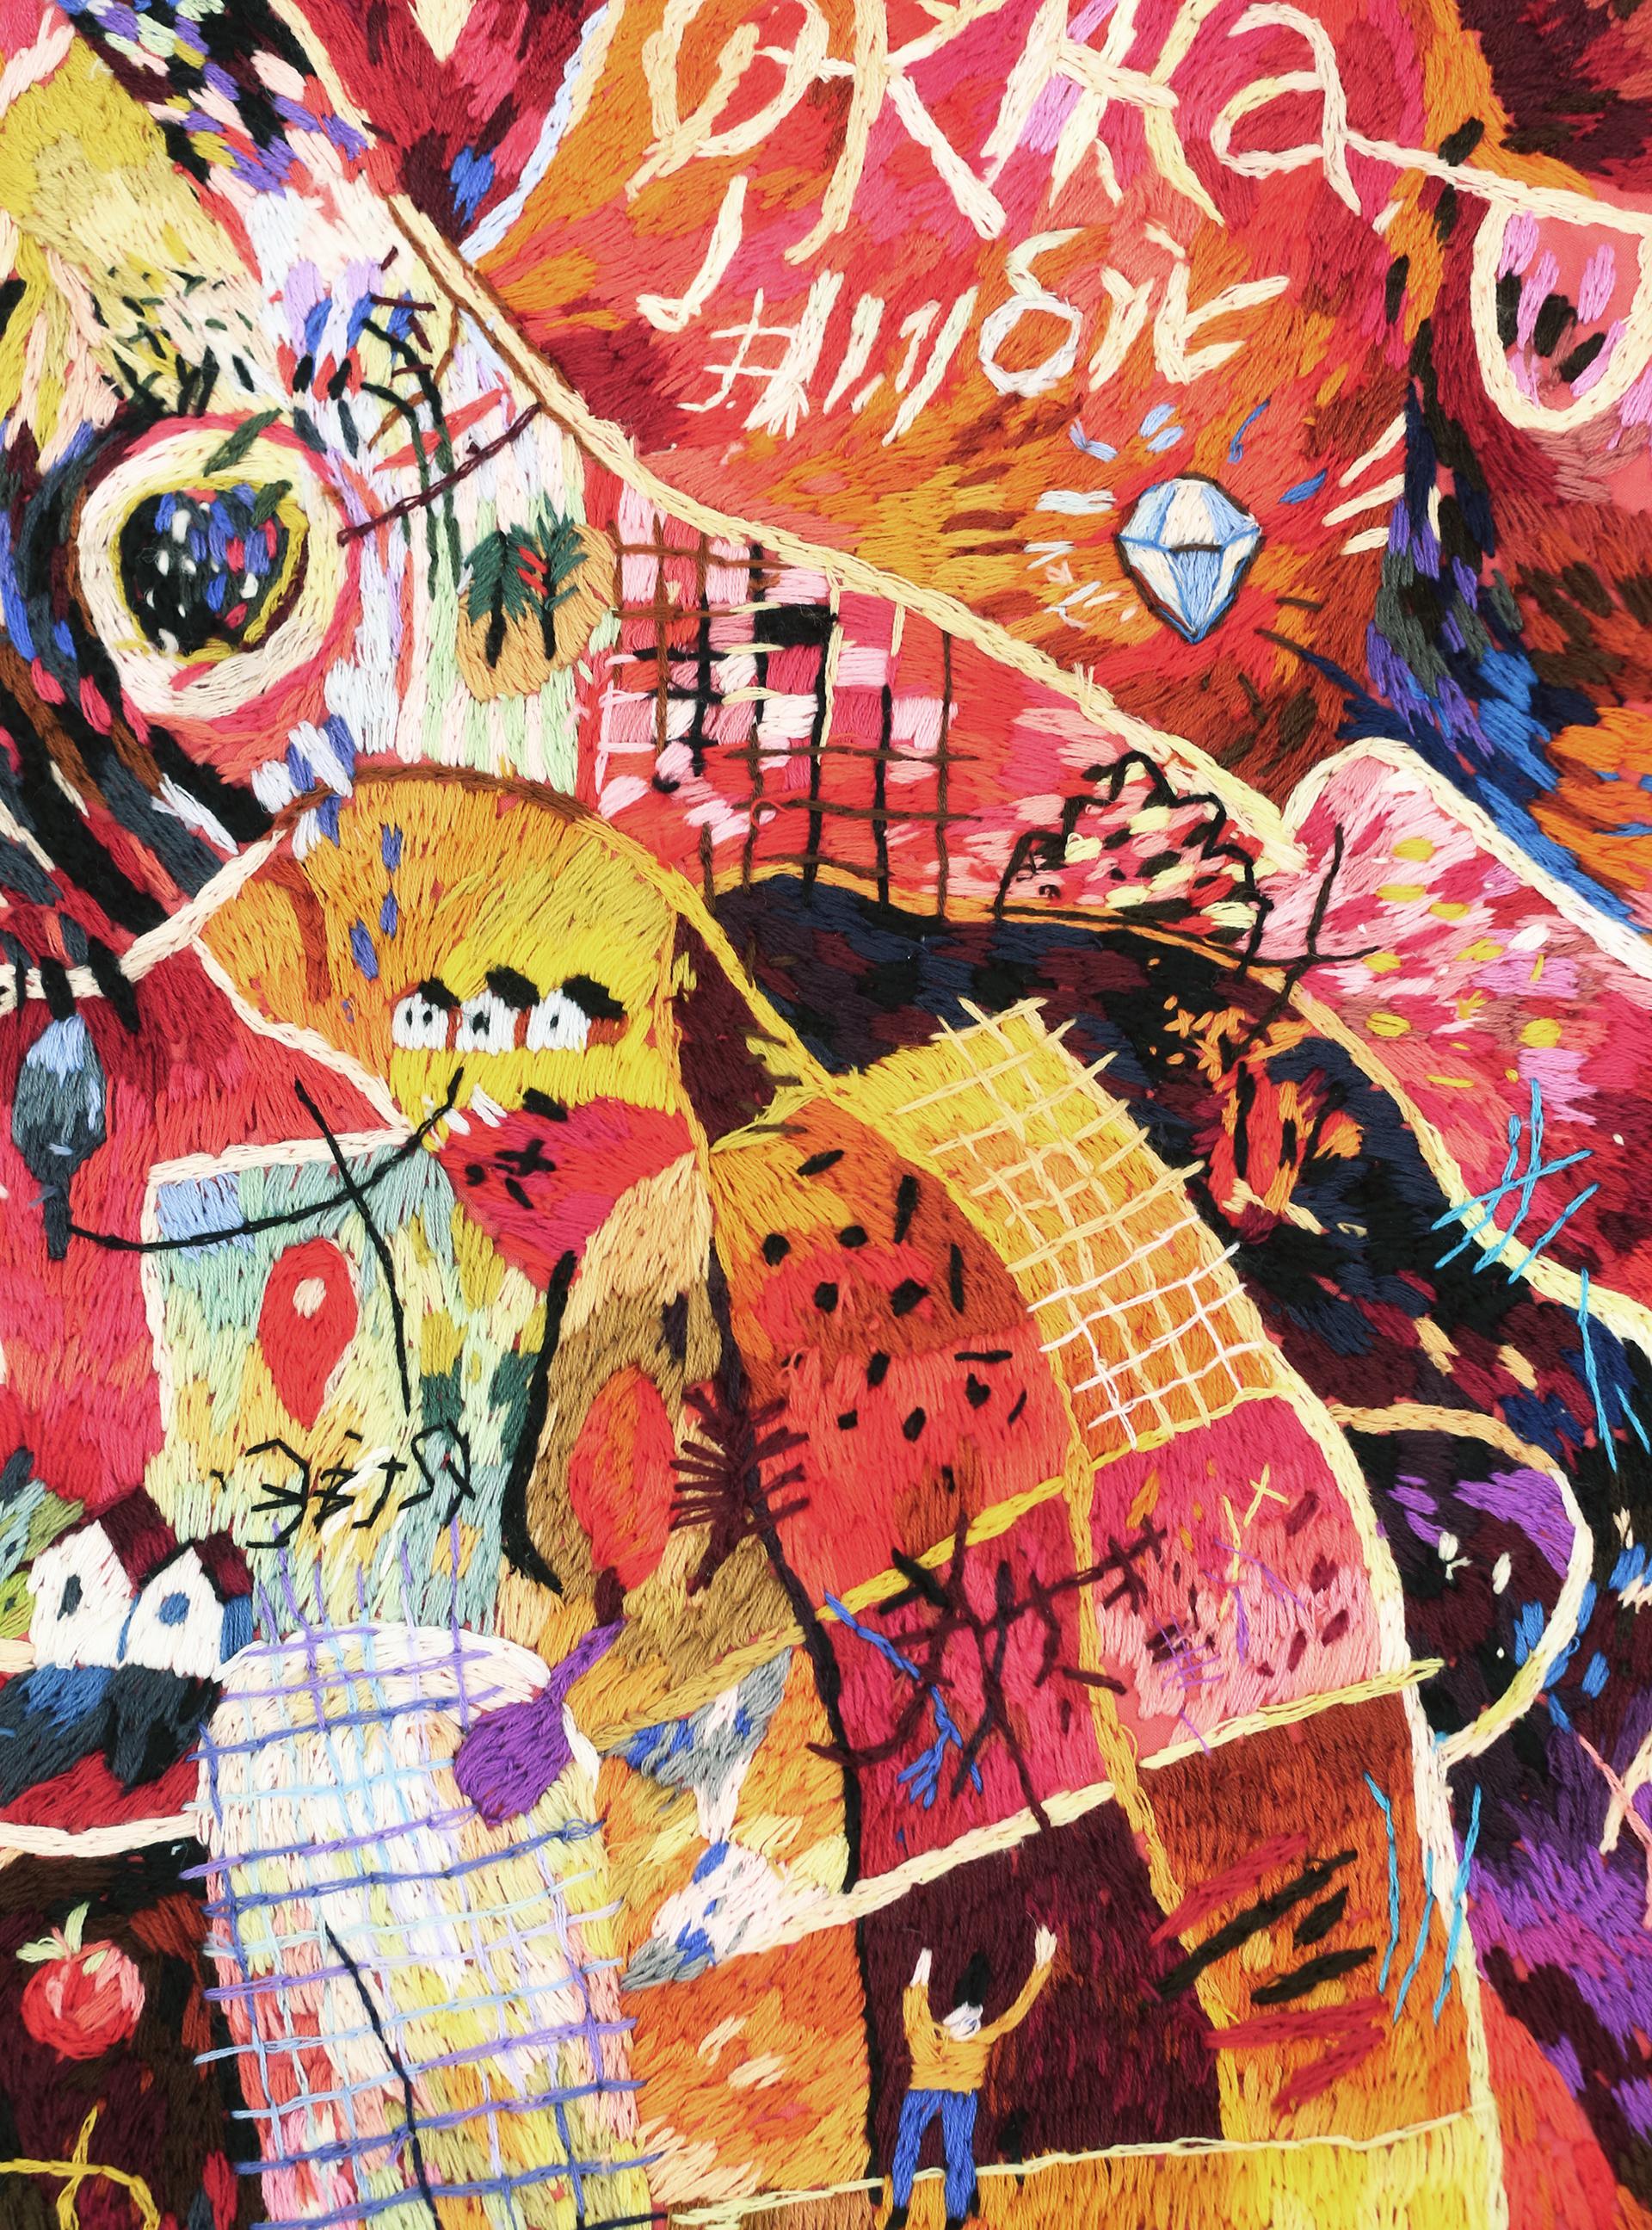 Embroidered Maps Lisa Smirnova 4